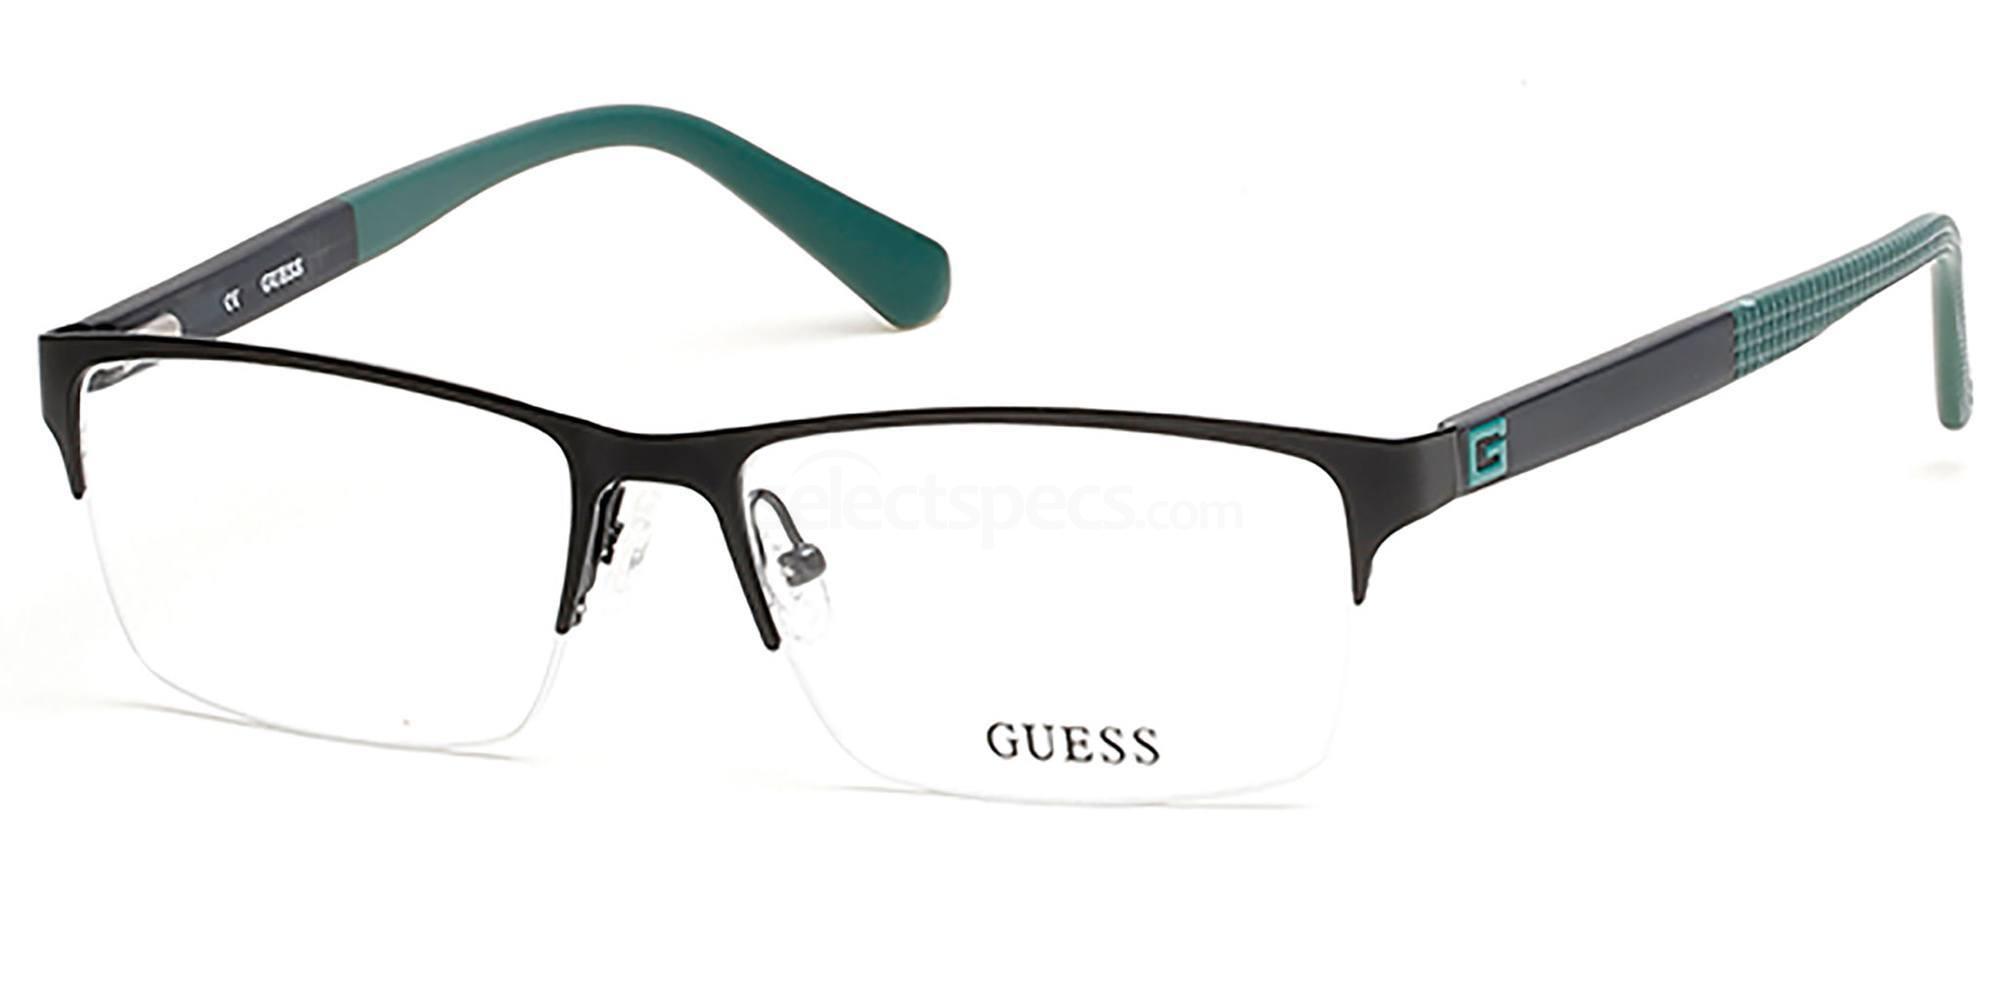 002 GU1879 Glasses, Guess